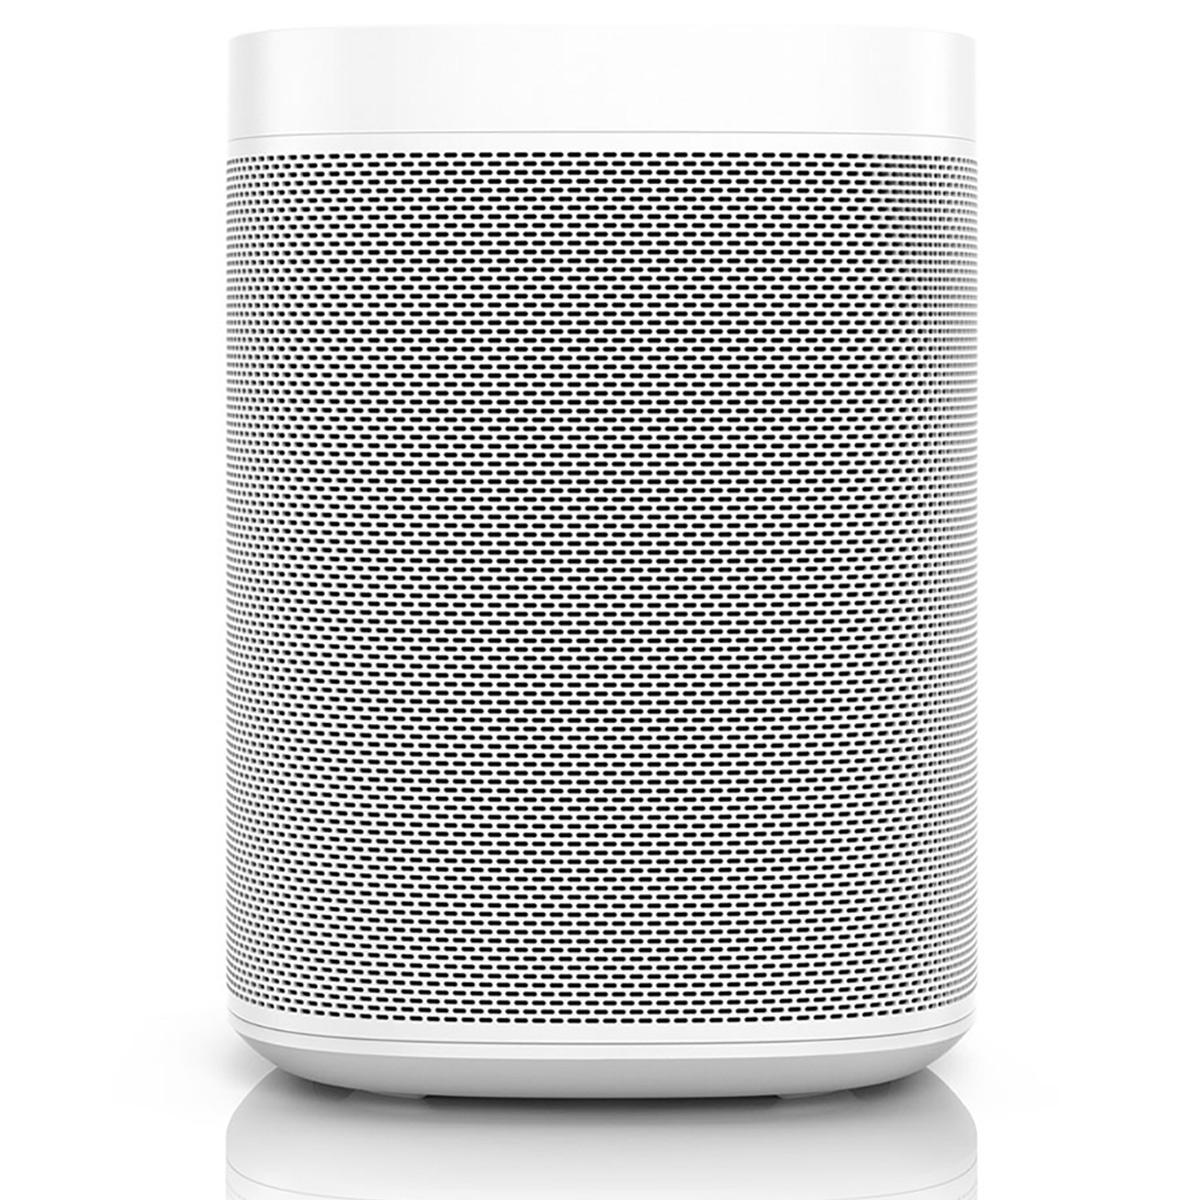 Sonos-One-Voice-Controlled-Wireless-Smart-Speaker-Gen-2 thumbnail 16